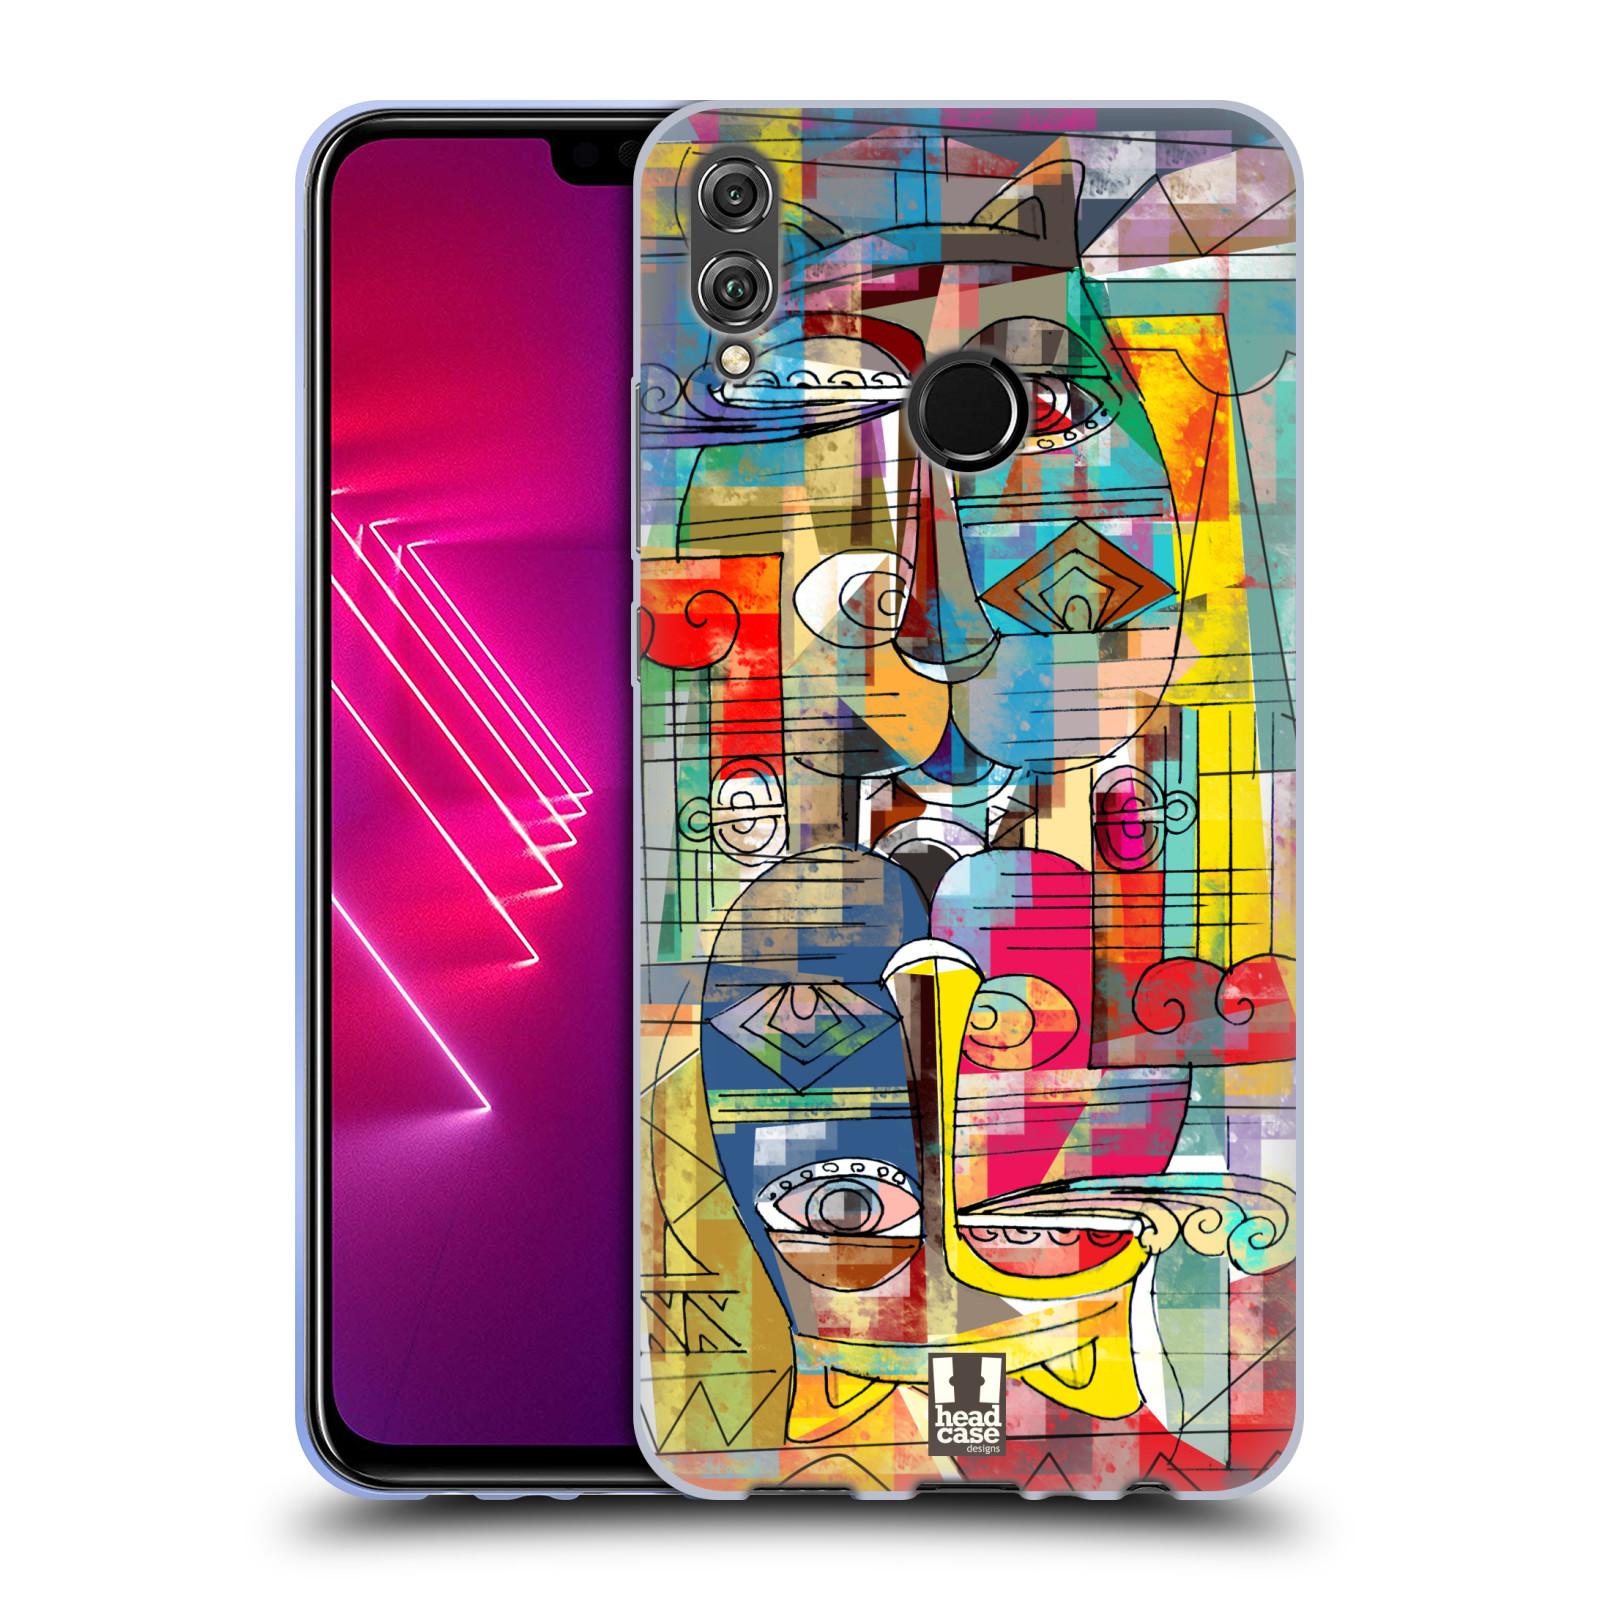 Silikonové pouzdro na mobil Honor View 10 Lite - Head Case - AZTEC MANX